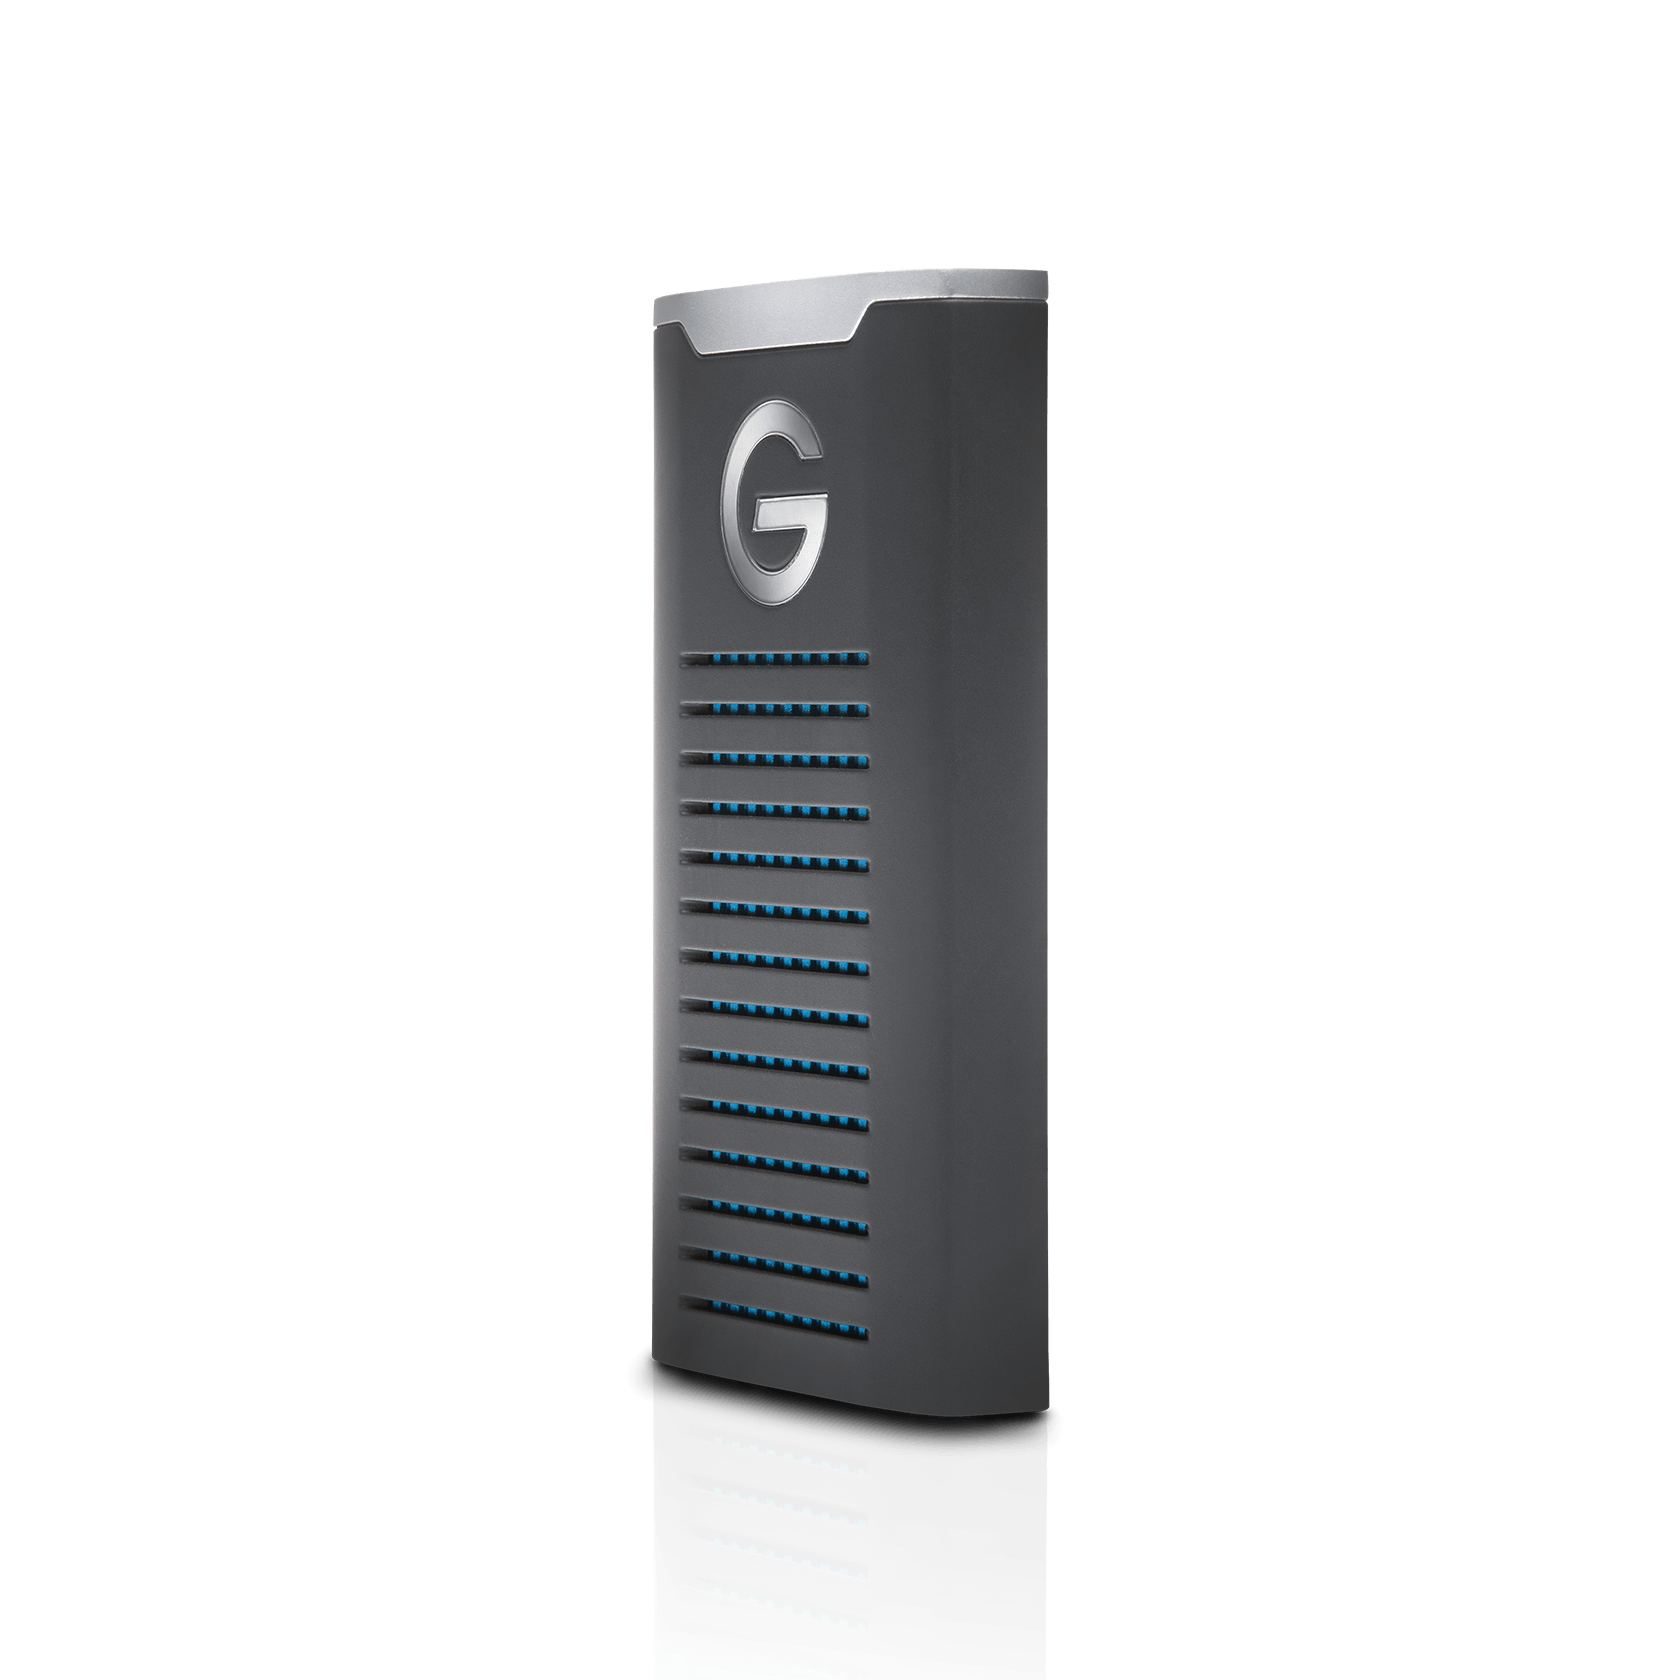 G-Technology 1TB G-DRIVE mobile SSD Durable Portable External Storage USB-C USB 3.1 Gen 2 - 0G06053